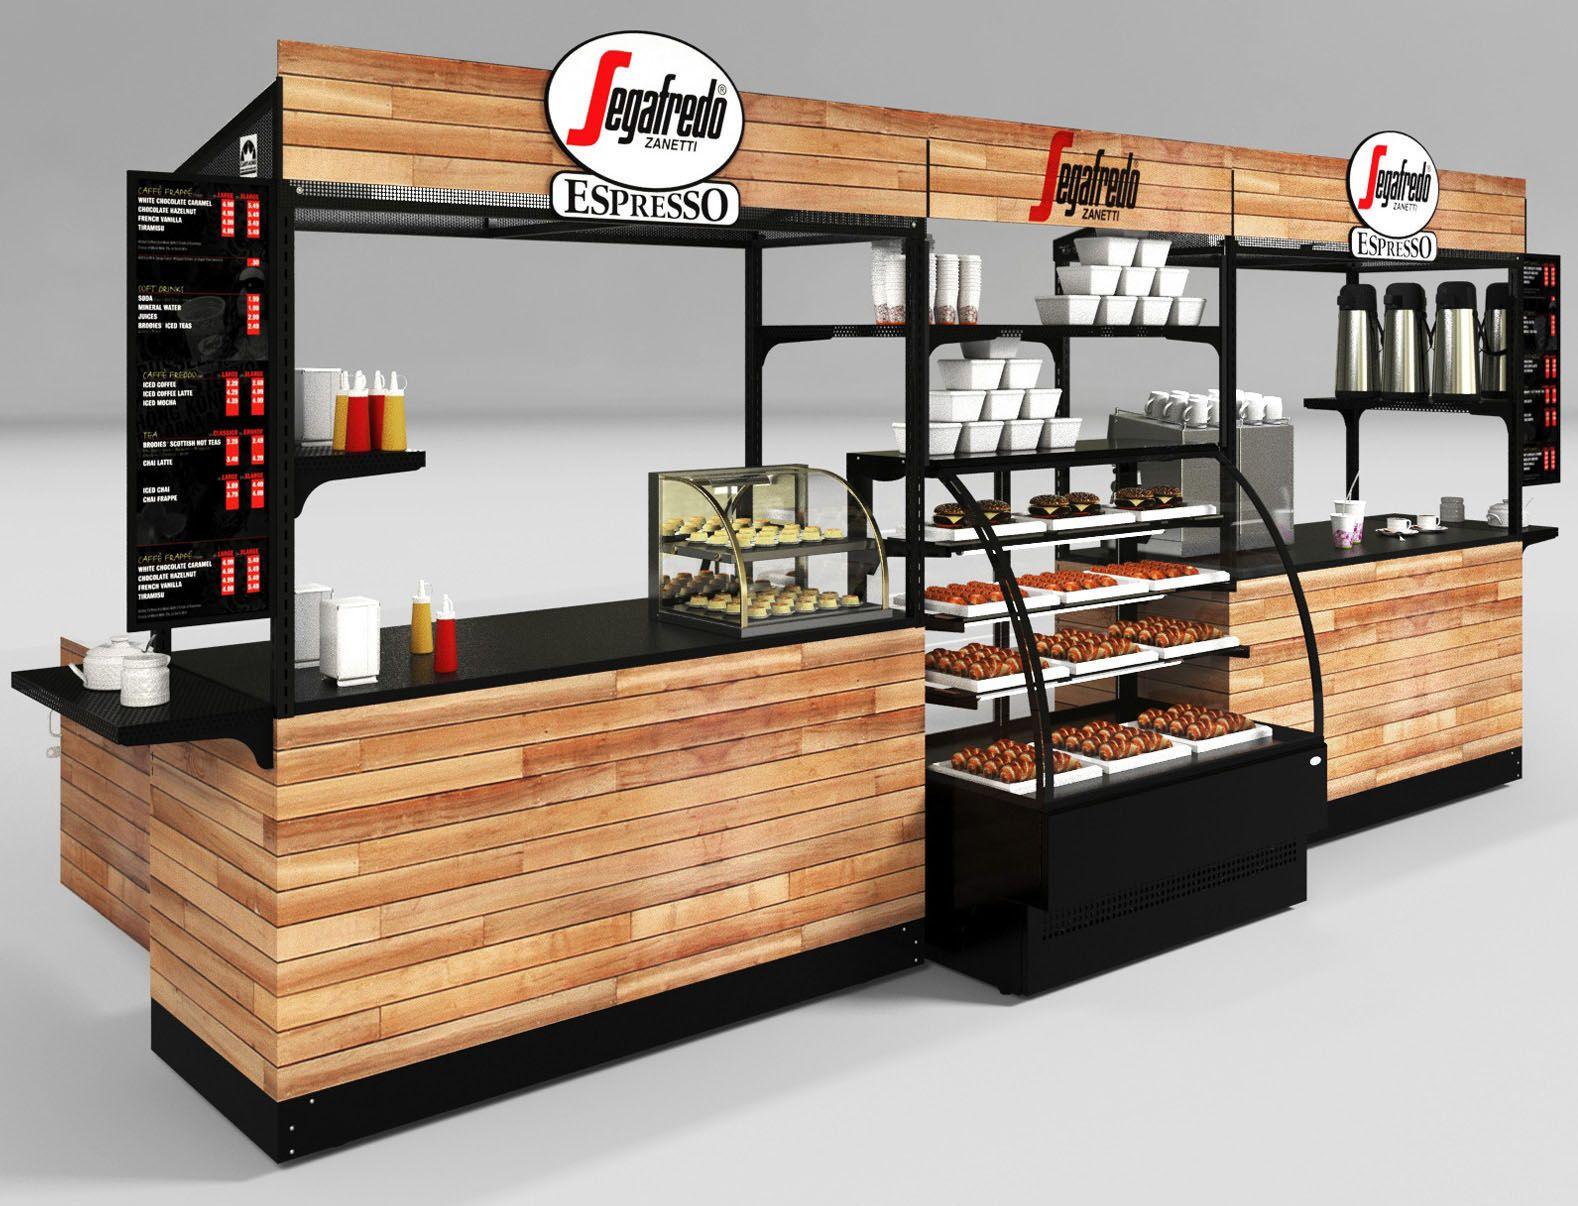 Video Lightbox Youtube Video Id 48ee 0zzupm Width 640 Height 480 Anchor Http Cart King Com Wp Content Kiosk Design Shop Counter Design Counter Design